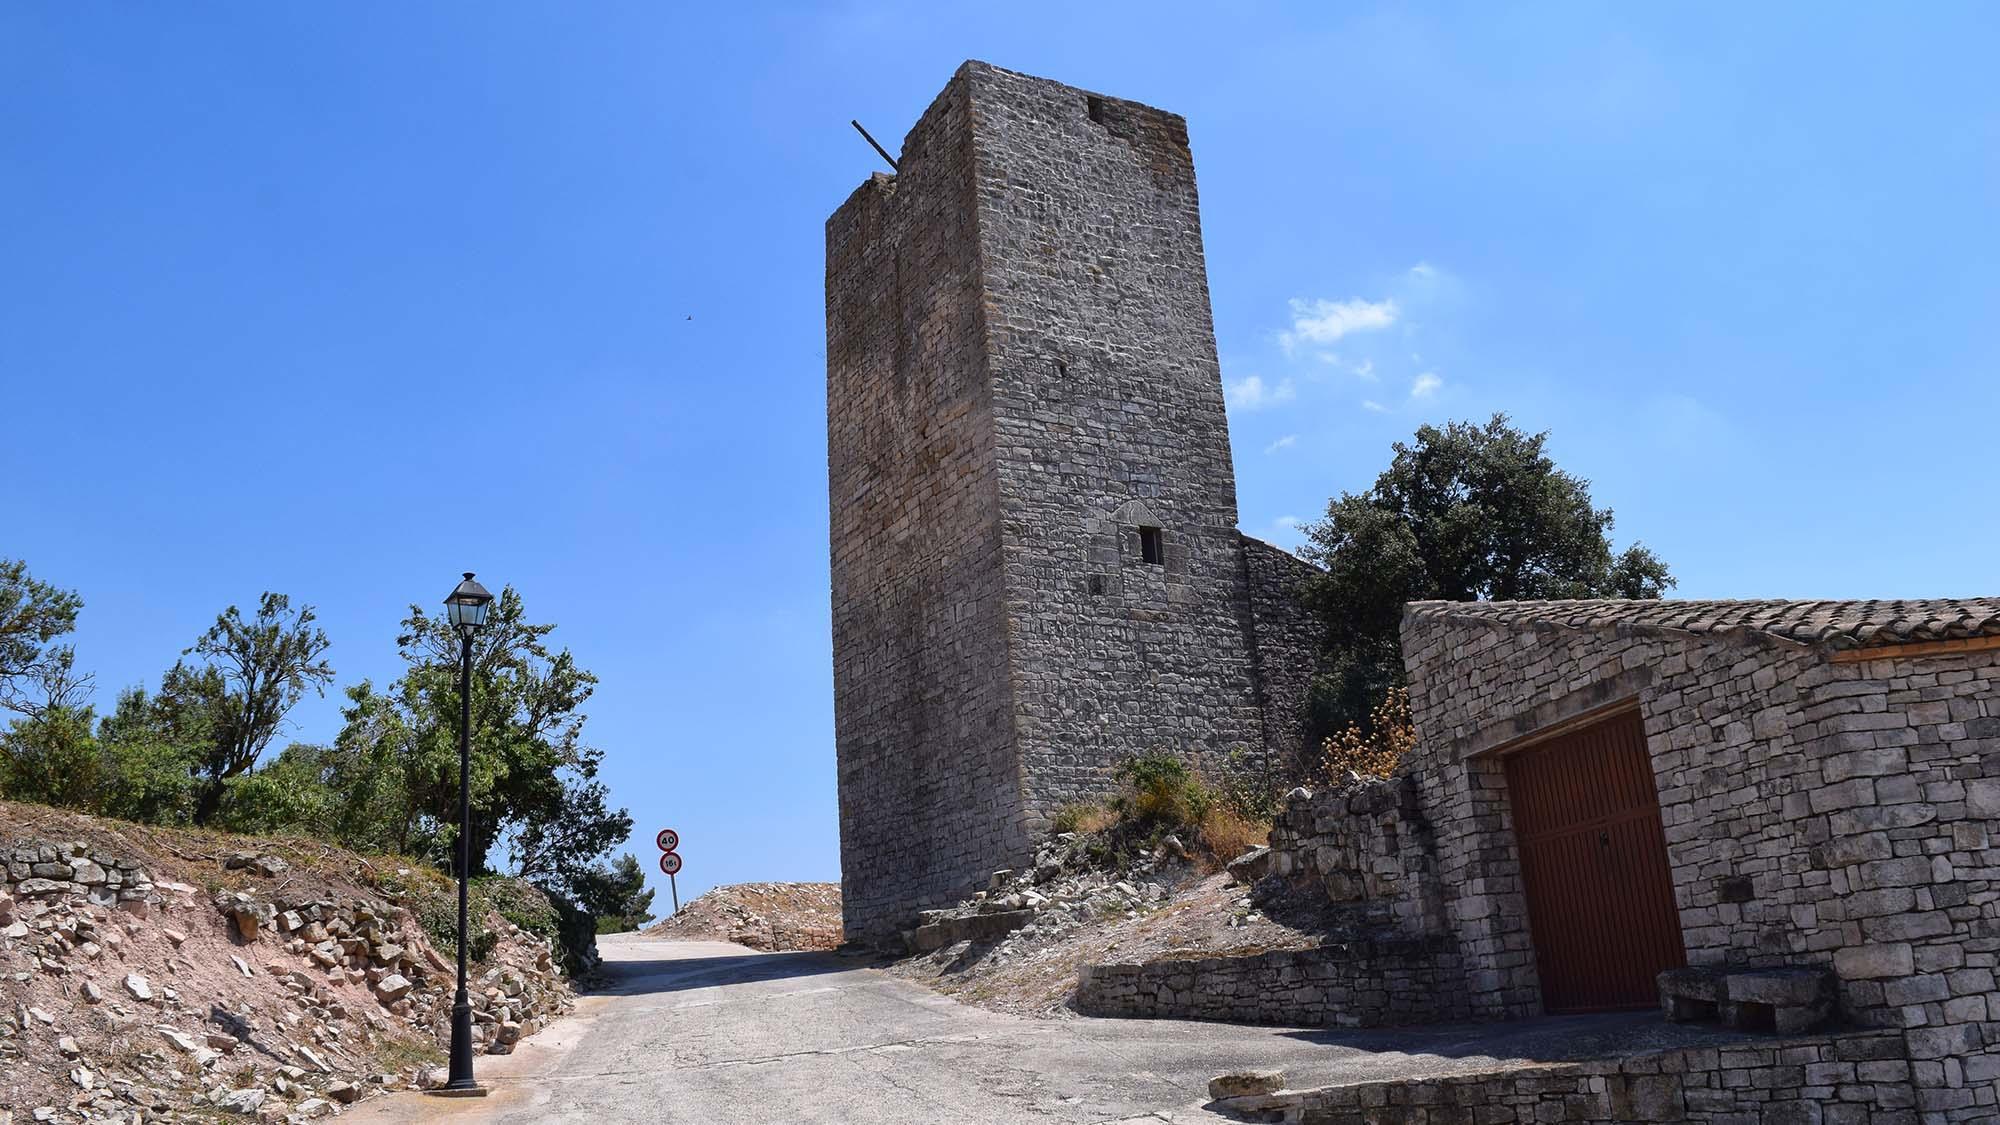 Tower Glorieta